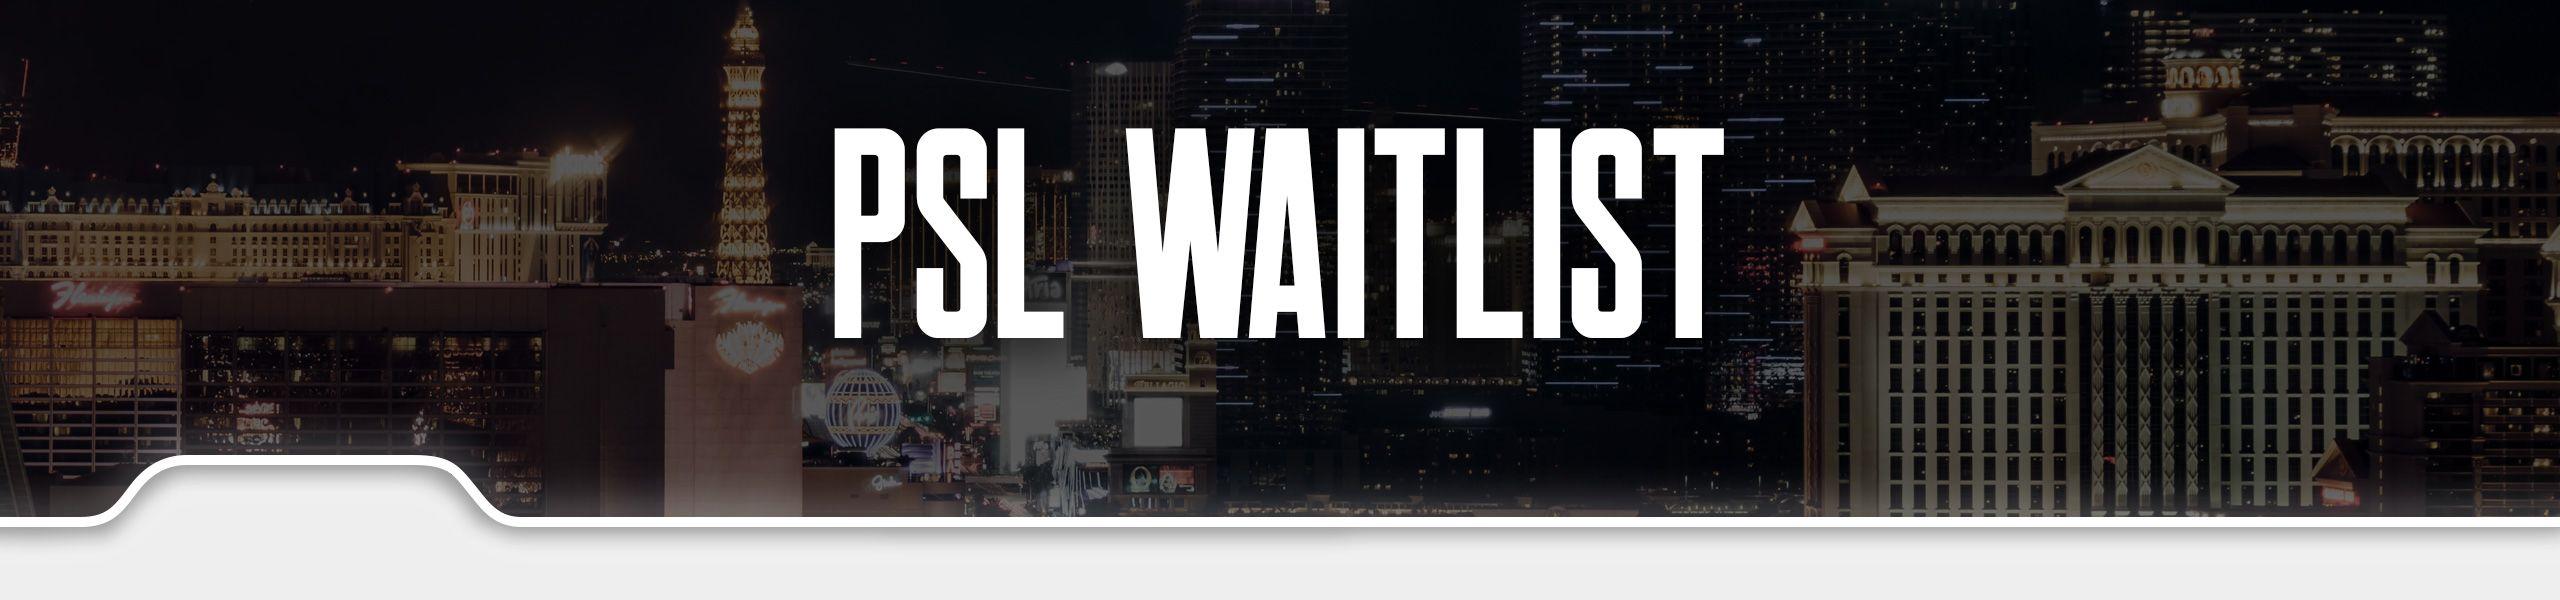 waitlist-hdr-2020